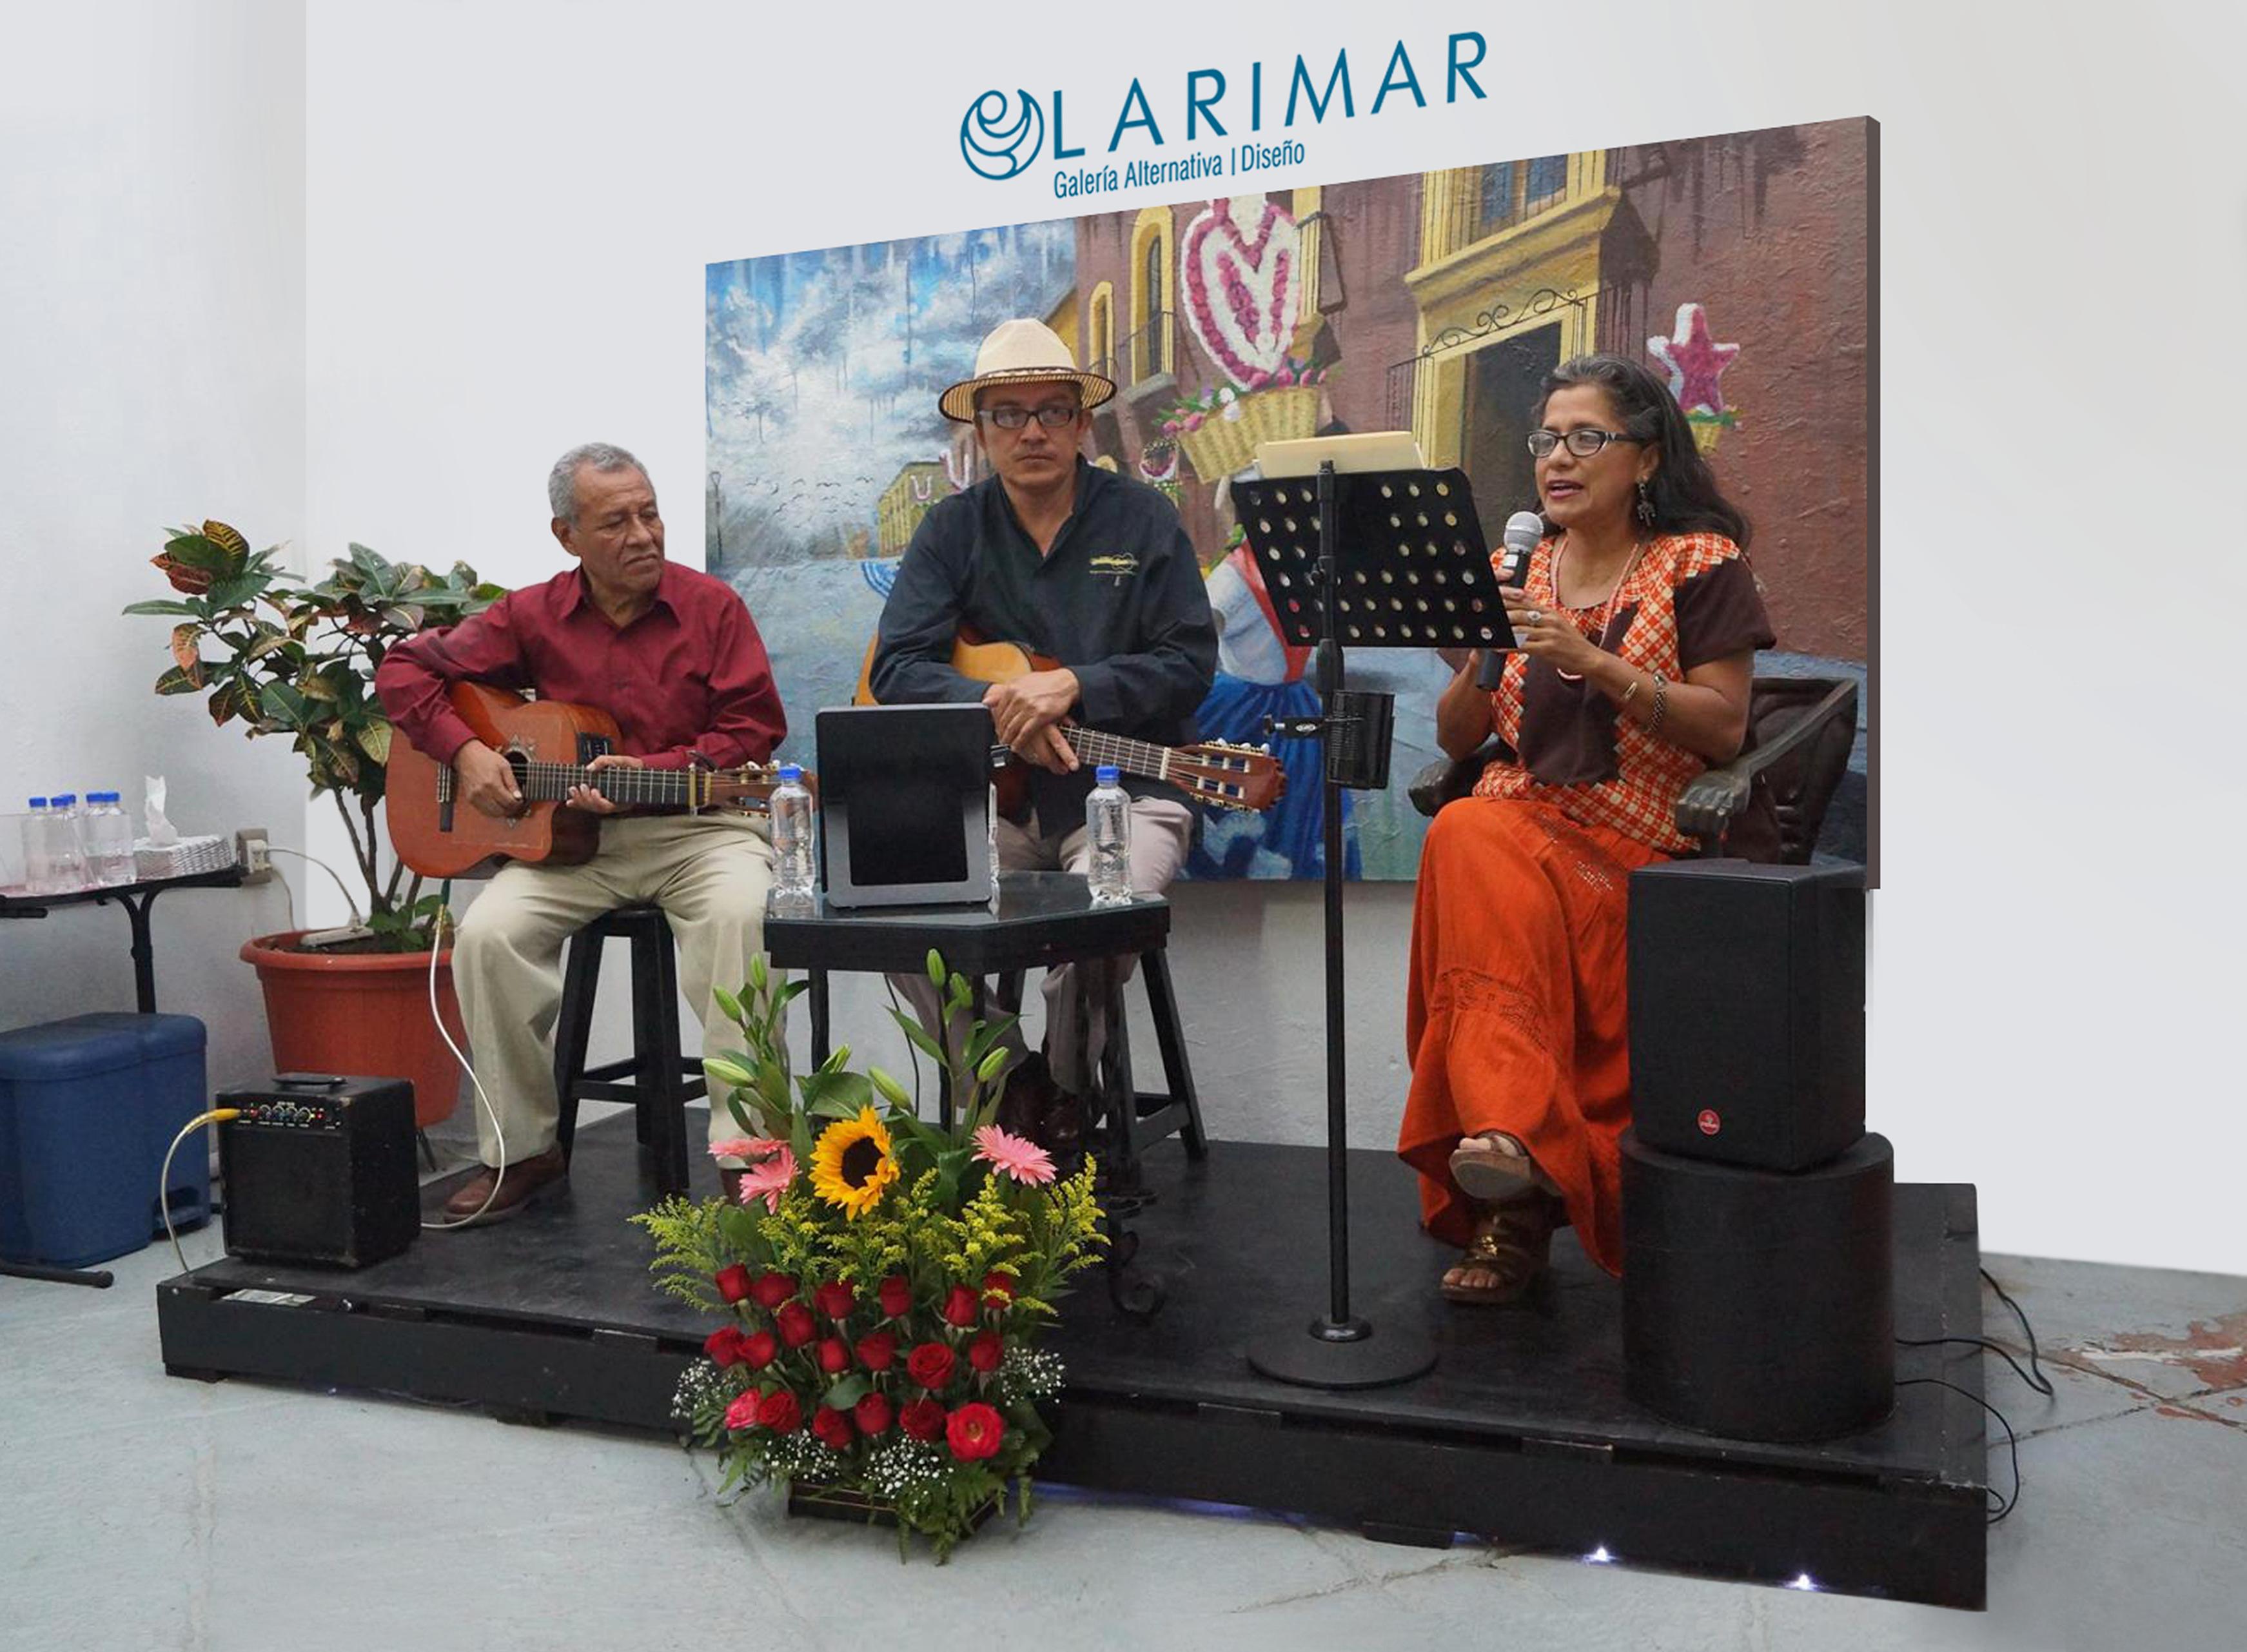 Larimar Gallery